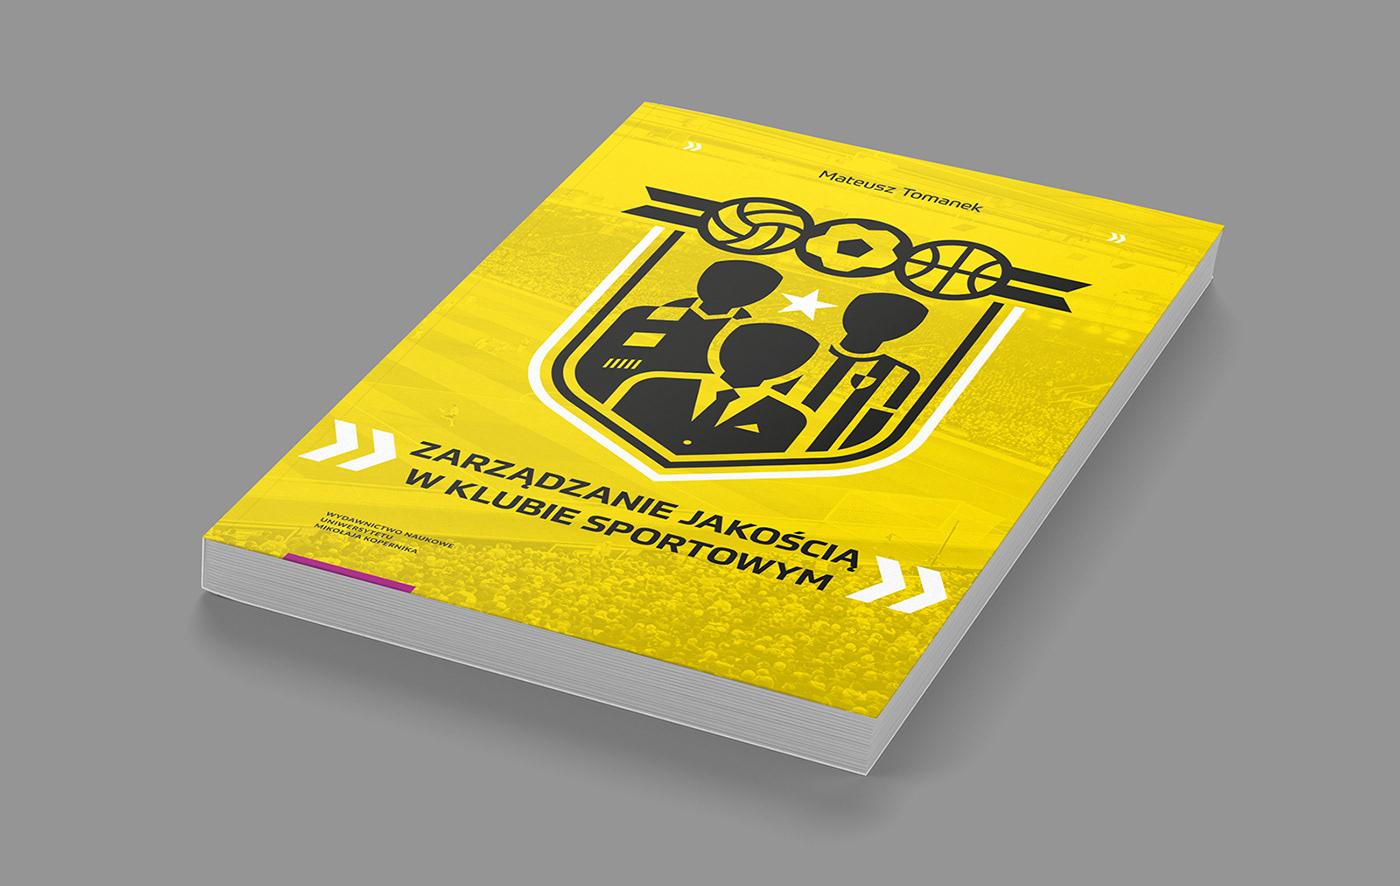 book cover business Investment książka law okładka okładka książki politics Sport Club sport management